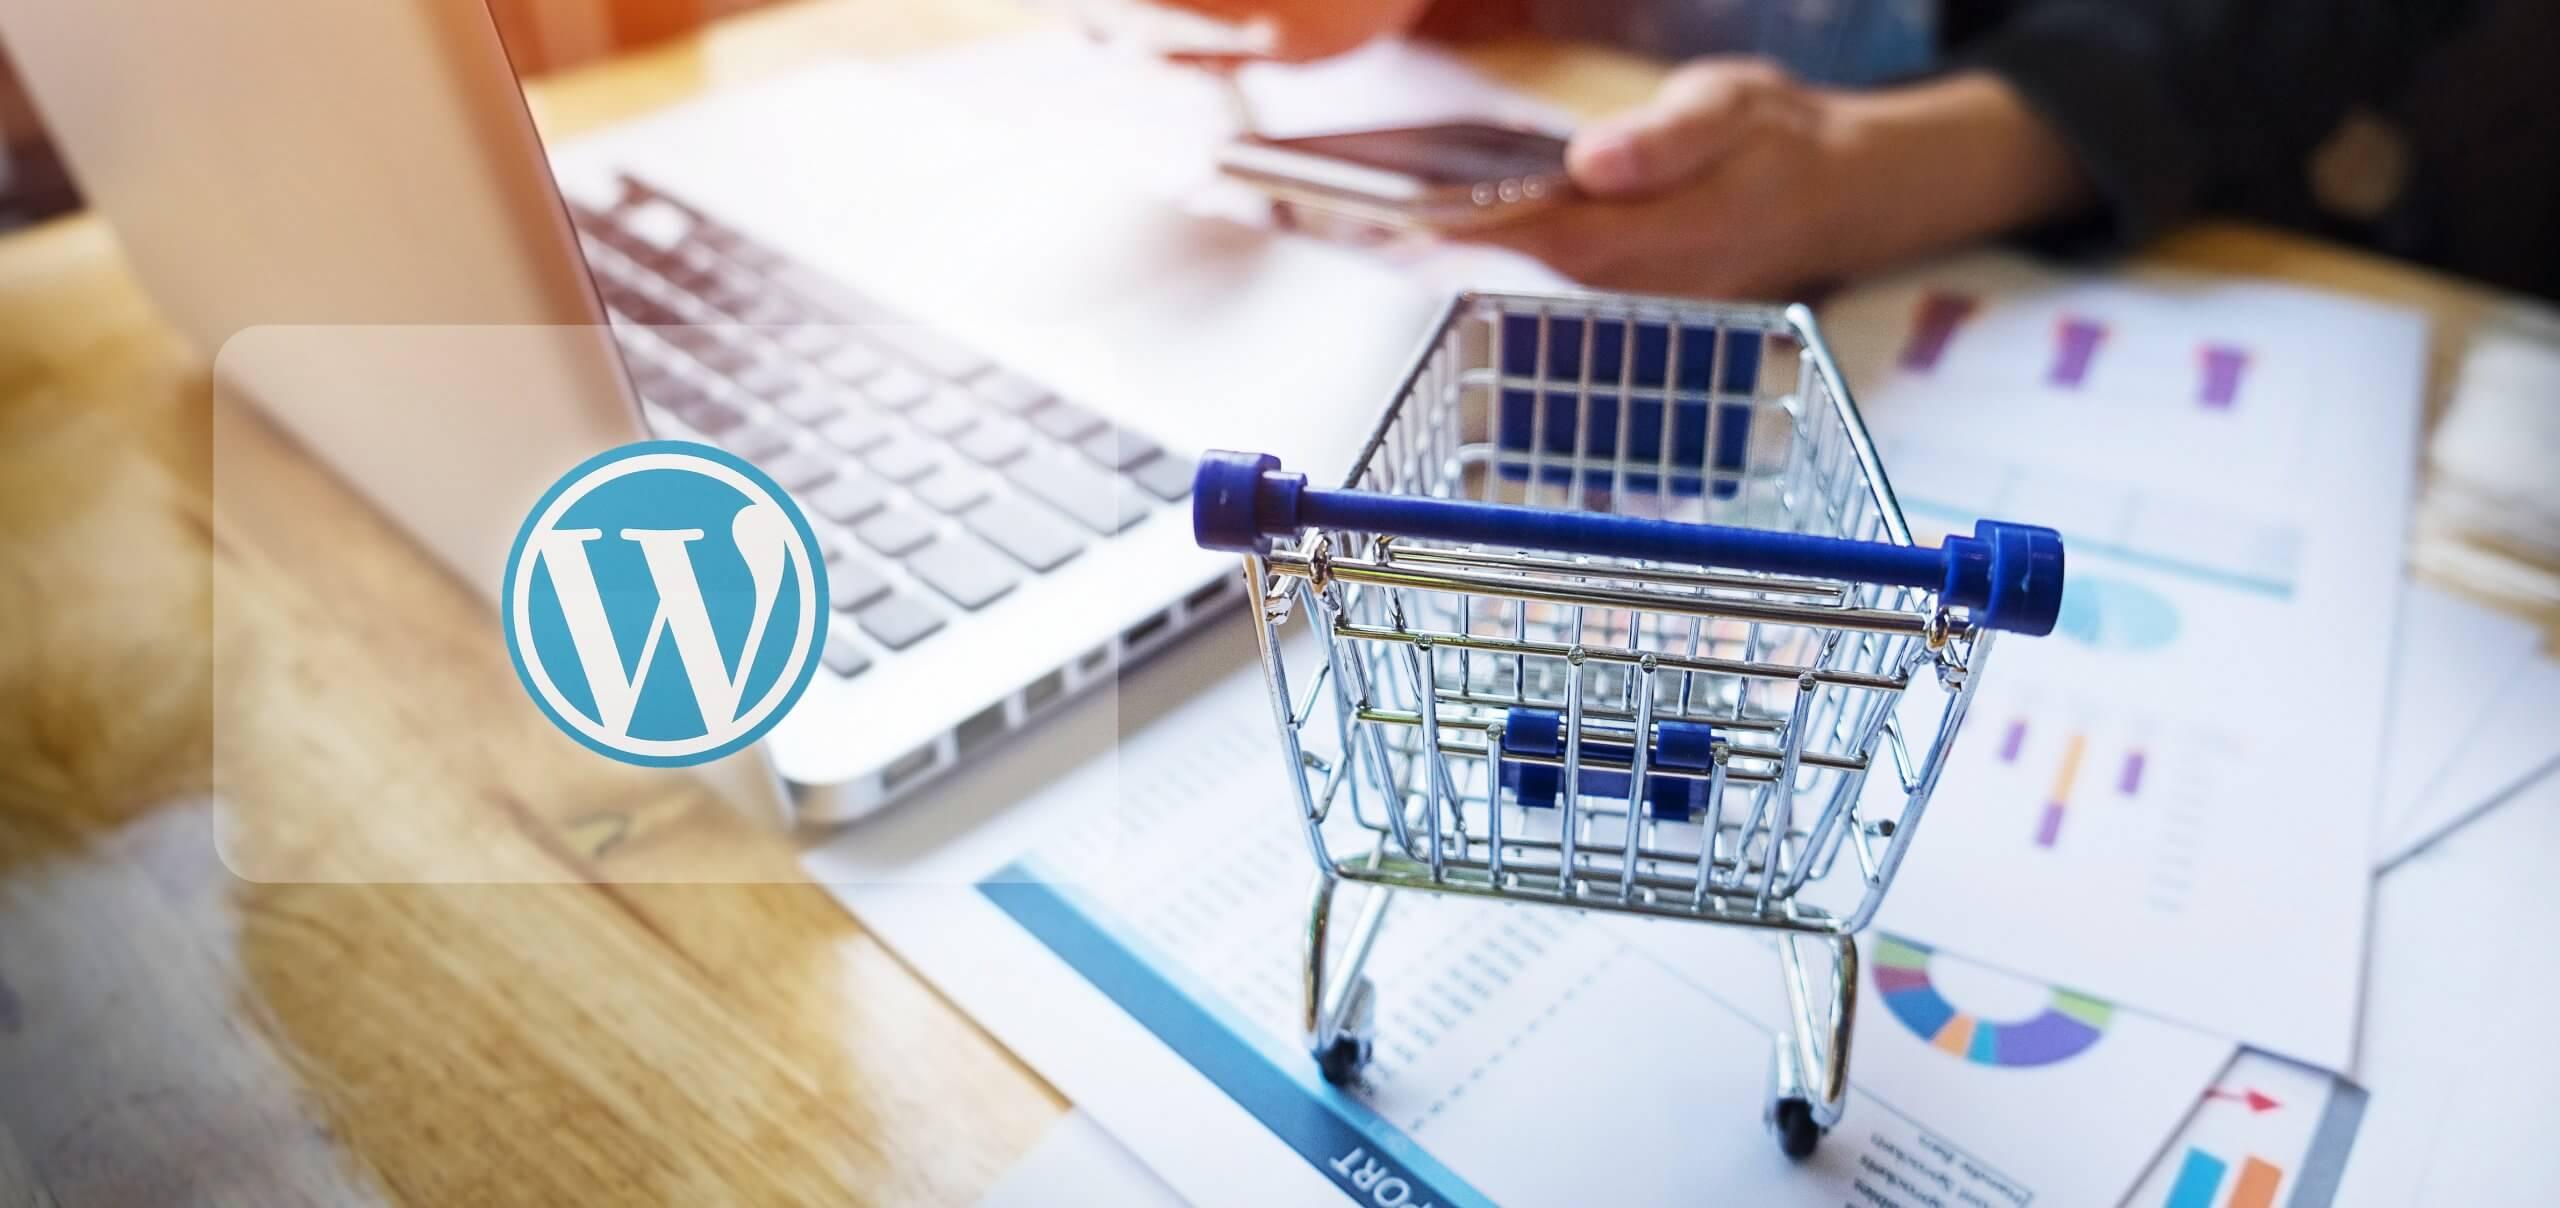 WordPress Development for eCommmerce